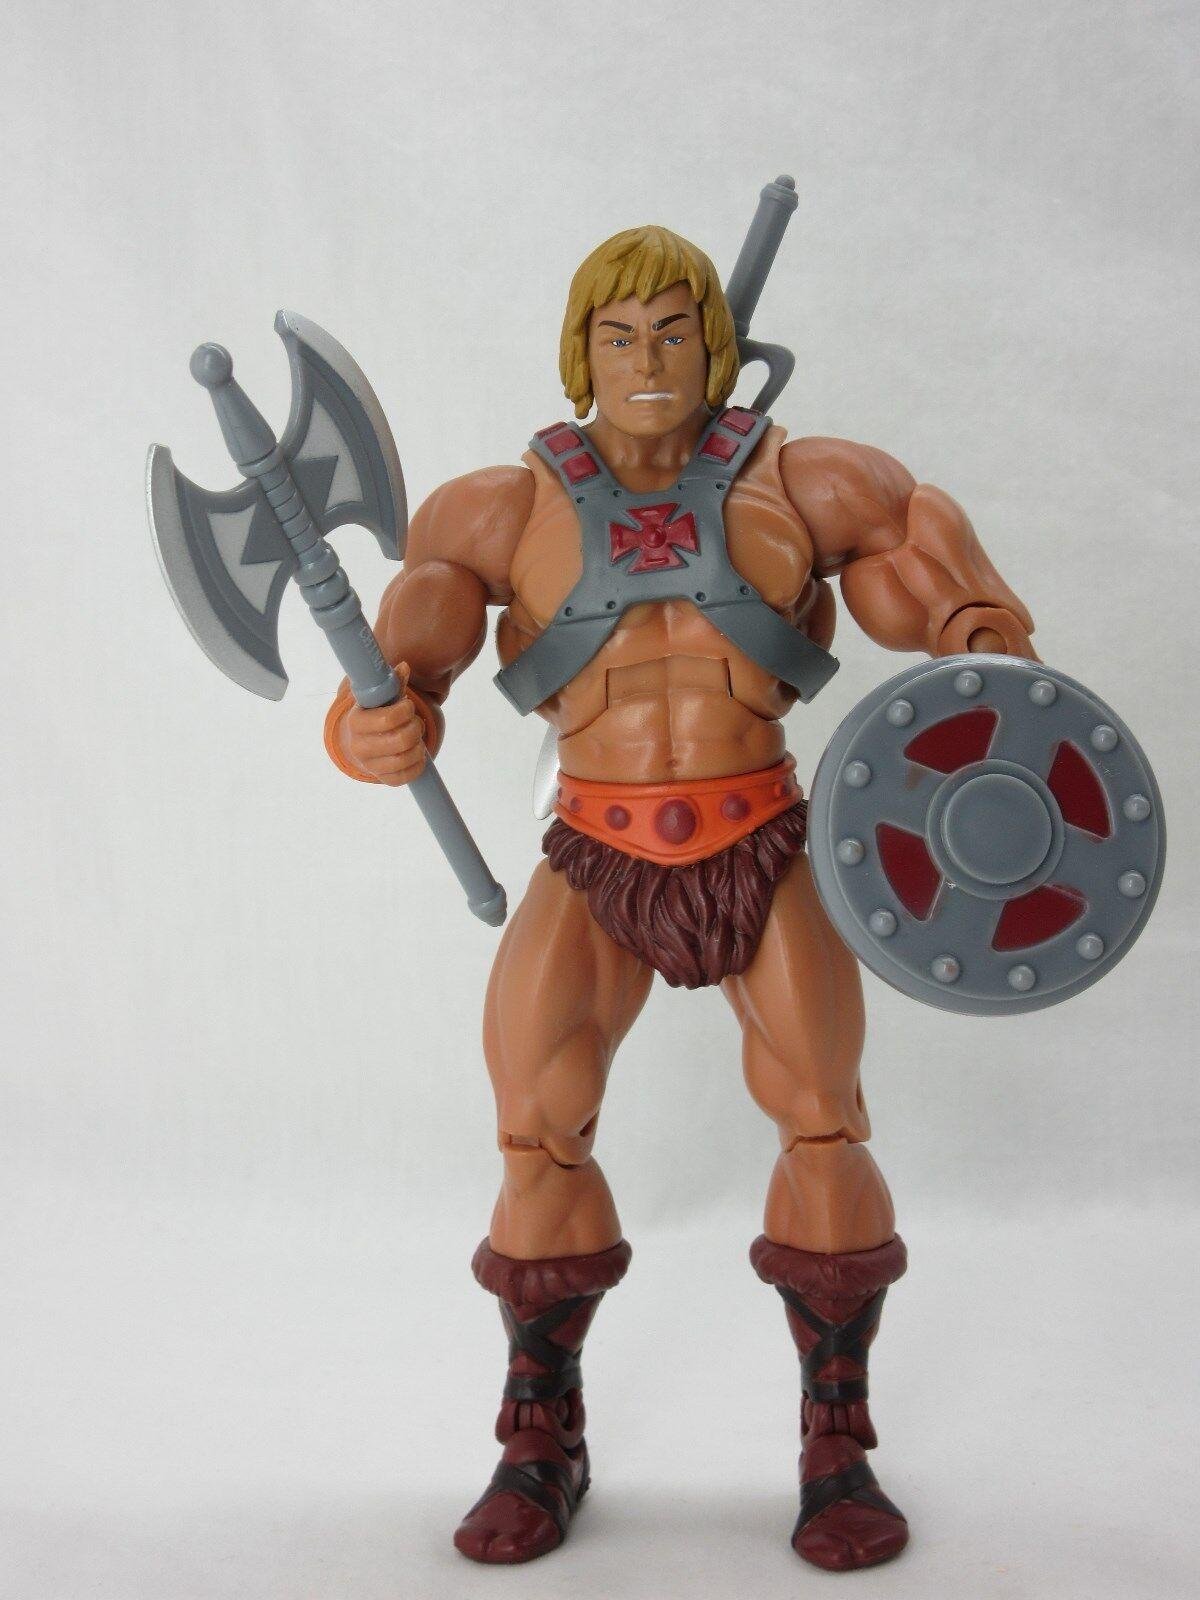 Motuc, Amos del universo, He-man, amos del universo clásicos, figura, él hombre